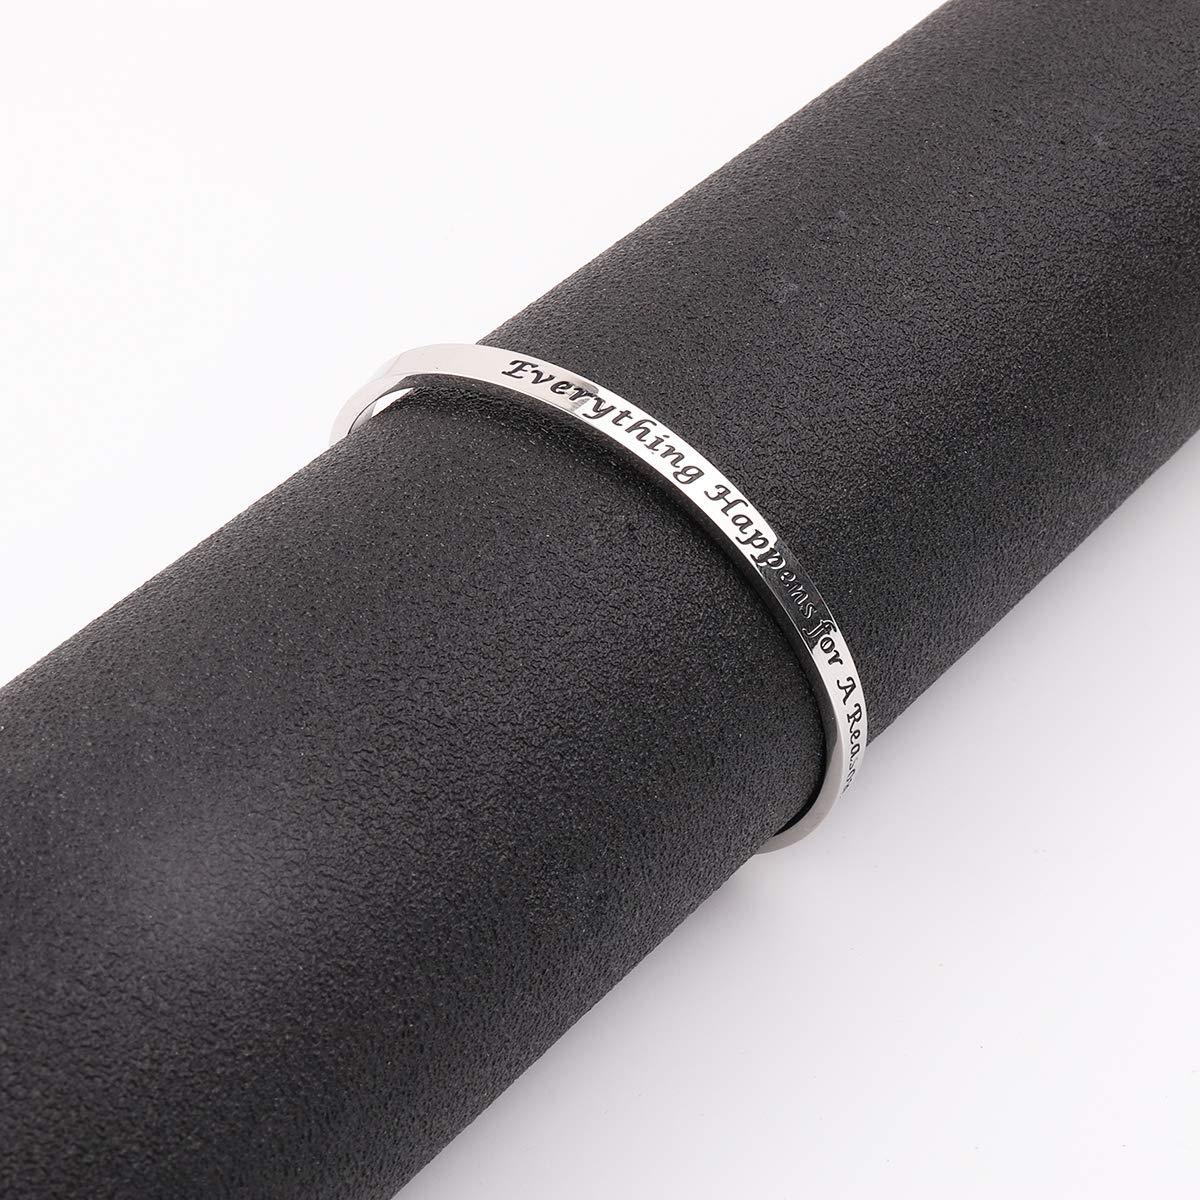 AZFEIYA Inspirational Bracelet Confidence Jewelry Motivational Cuff Bracelet Everything Happens for a Reason Encouragement Bracelet Personalized Birthday Gift (Silver Bracelet) by AZFEIYA (Image #5)